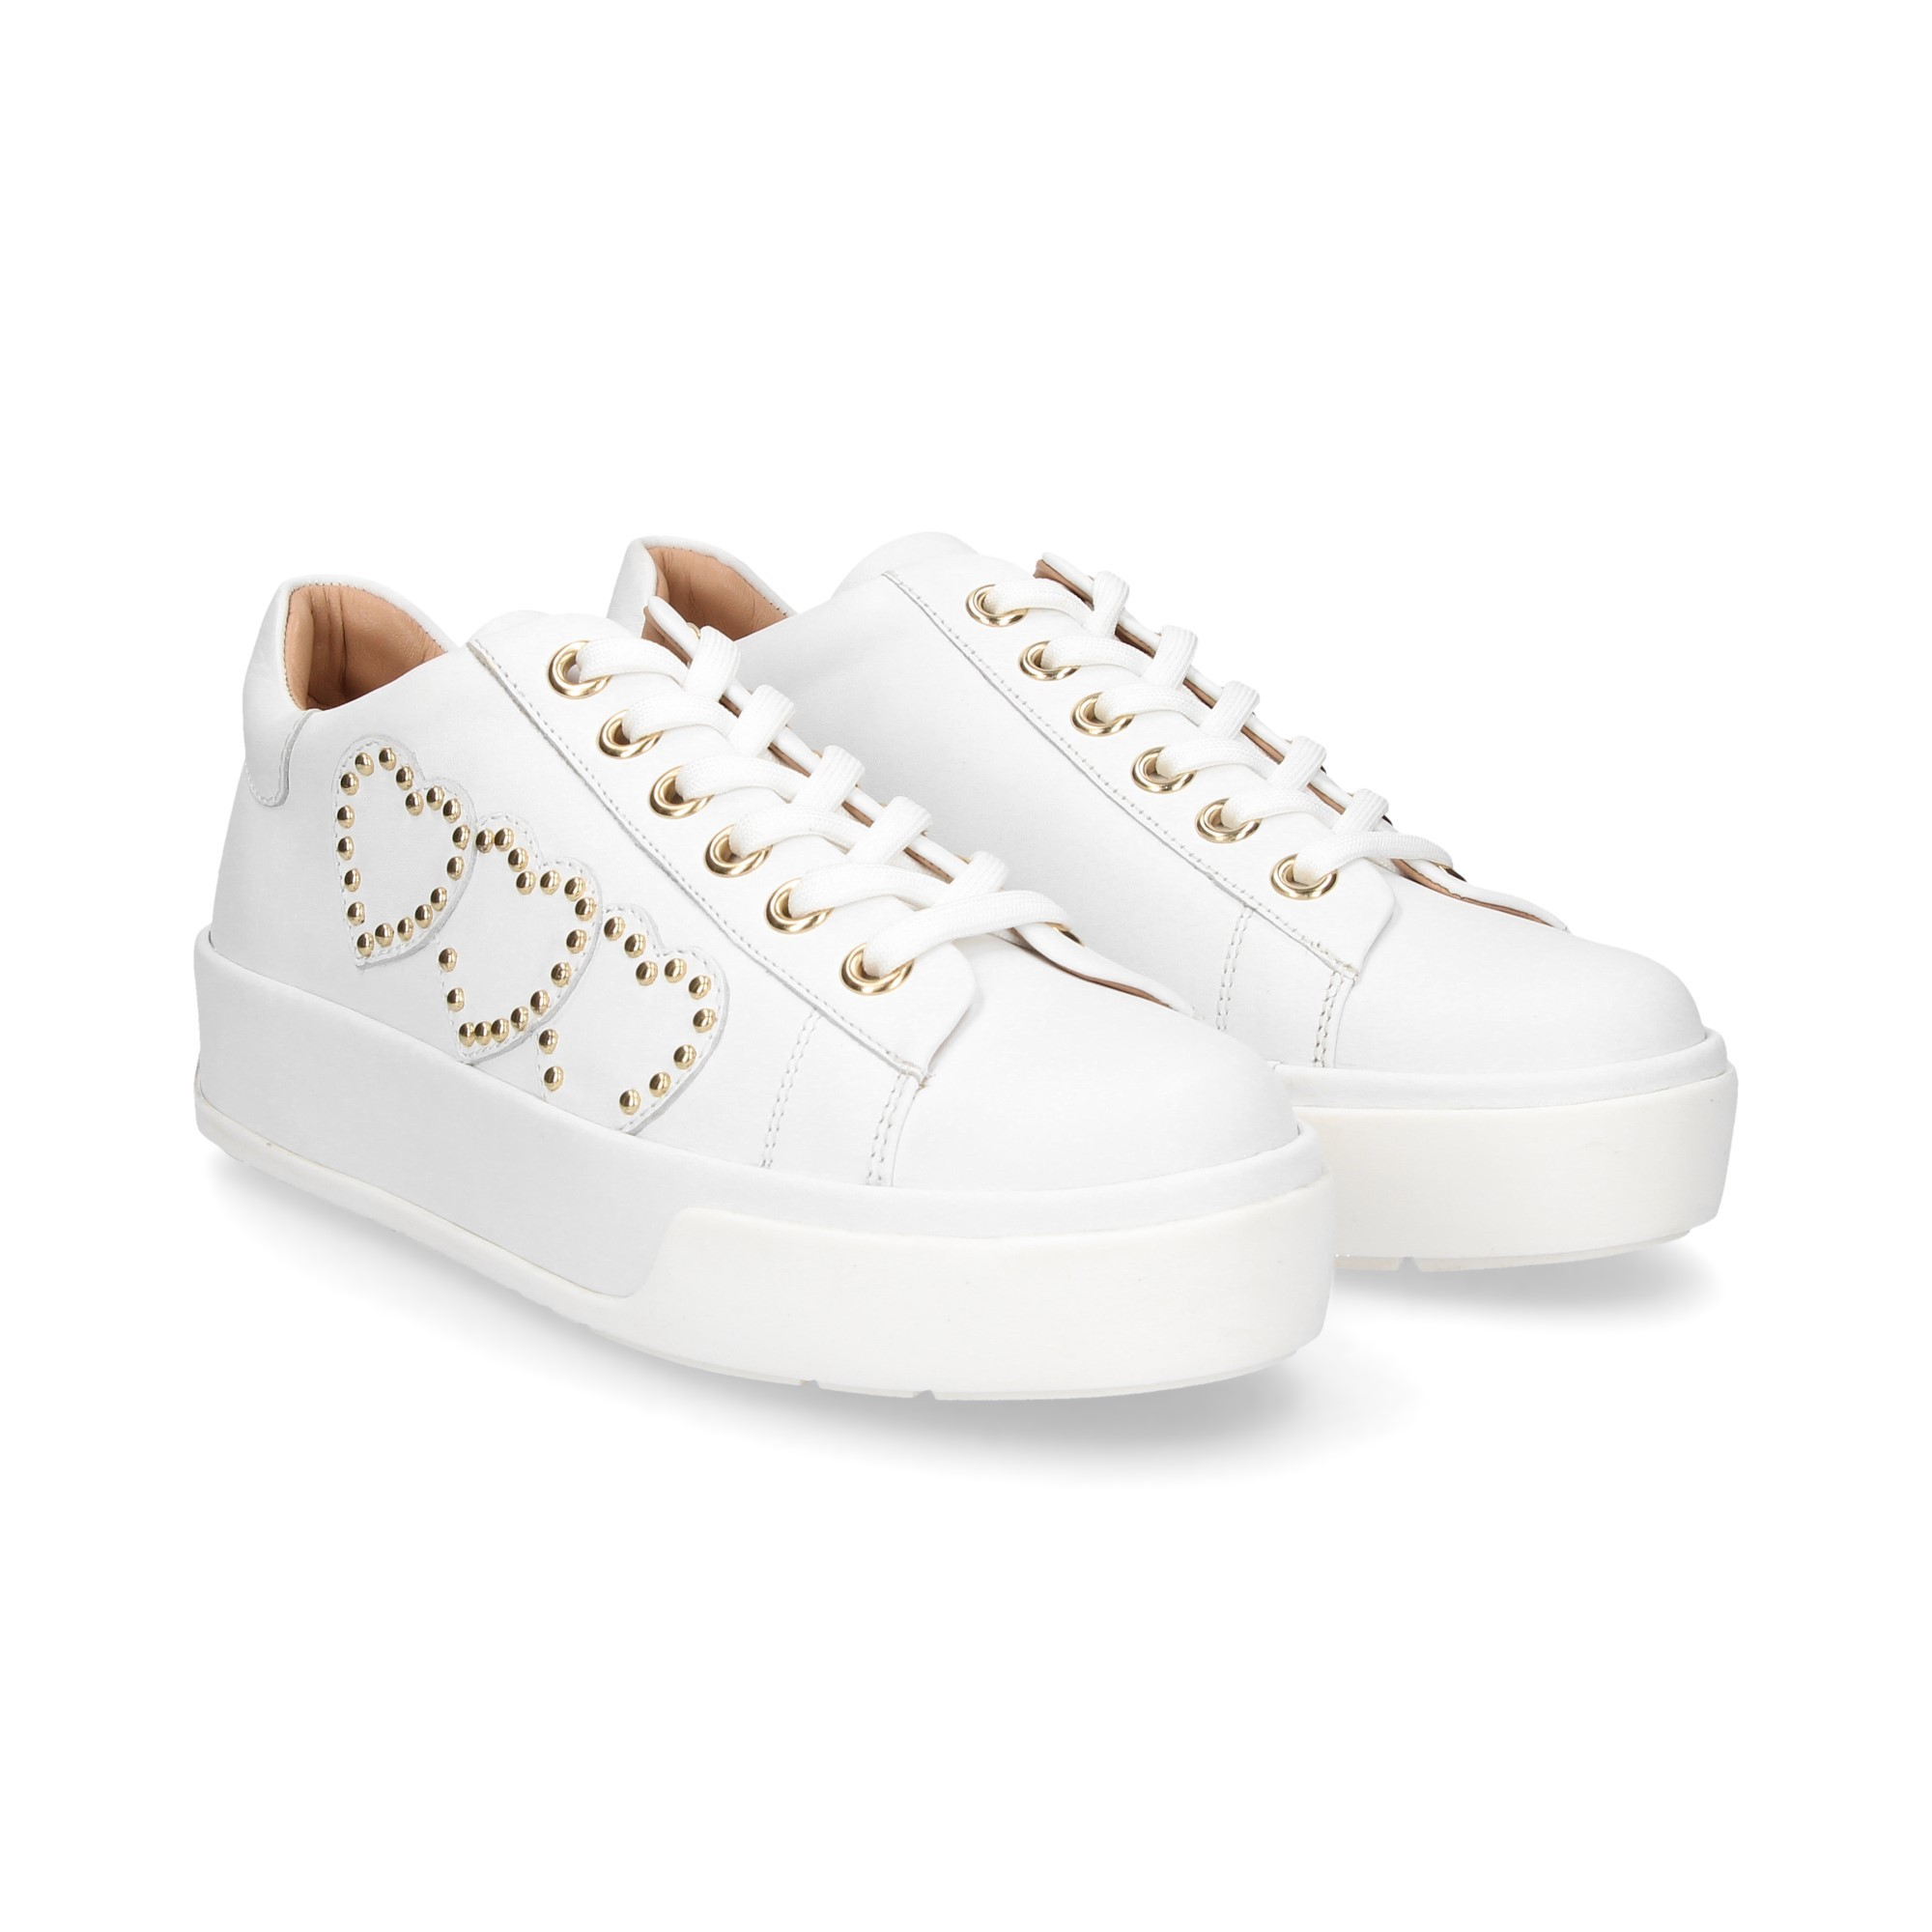 Zapatillas 1 para White mujer Twinset Ca8paq Optical OP8nk0XNw